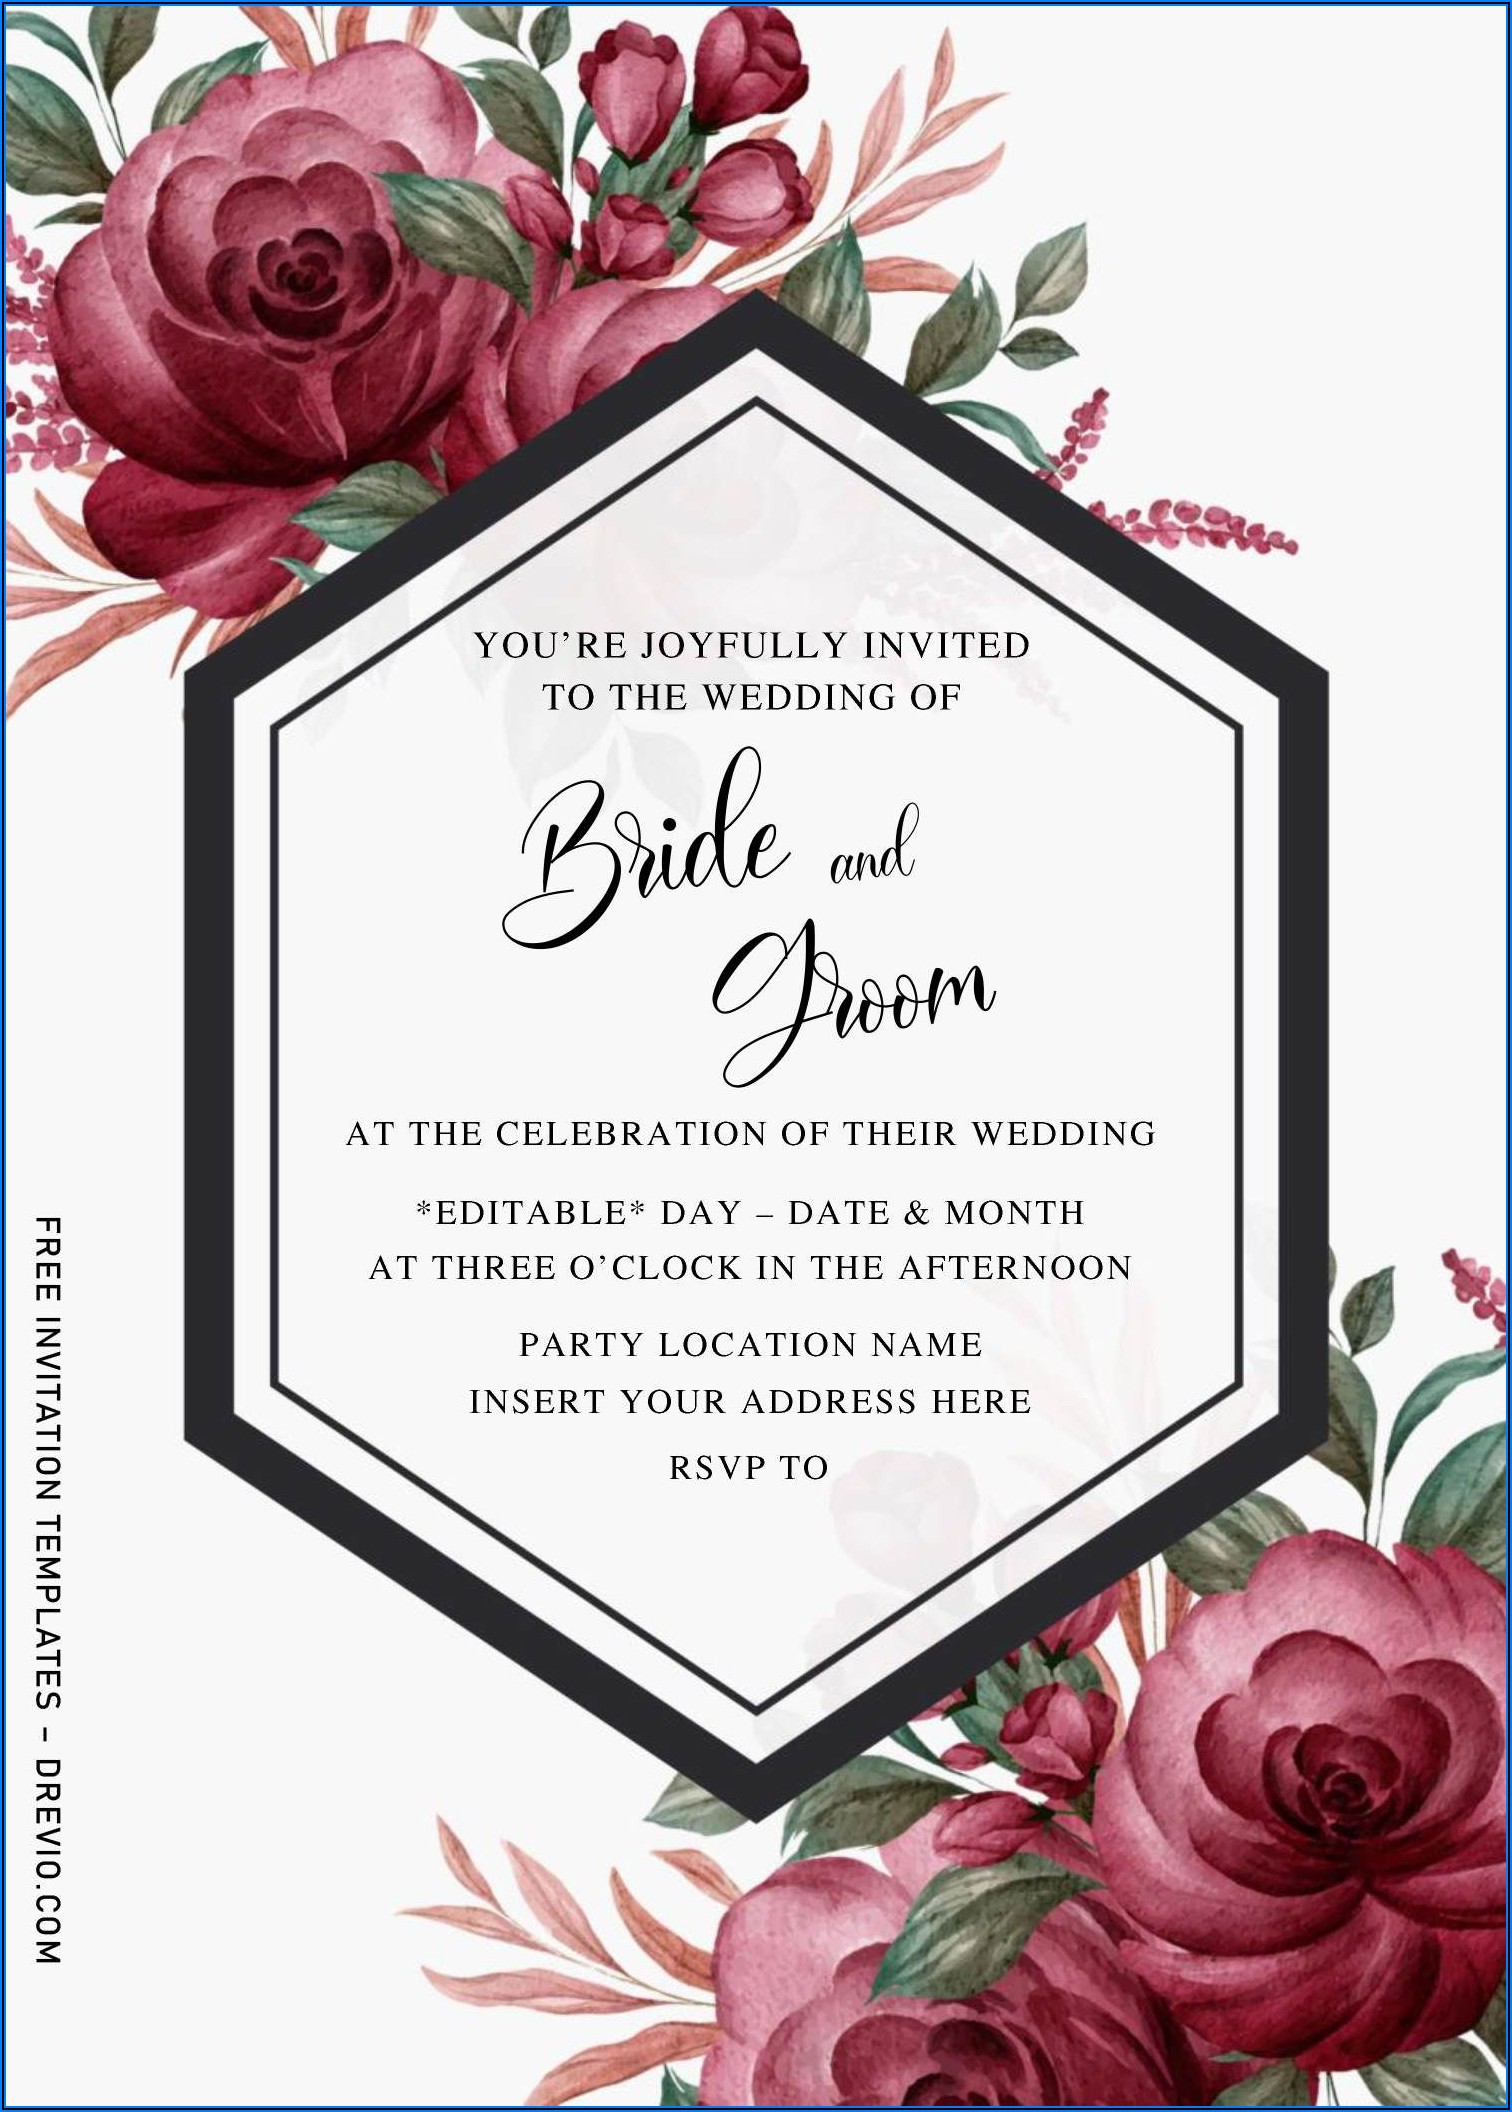 Burgundy Wedding Invitations Templates